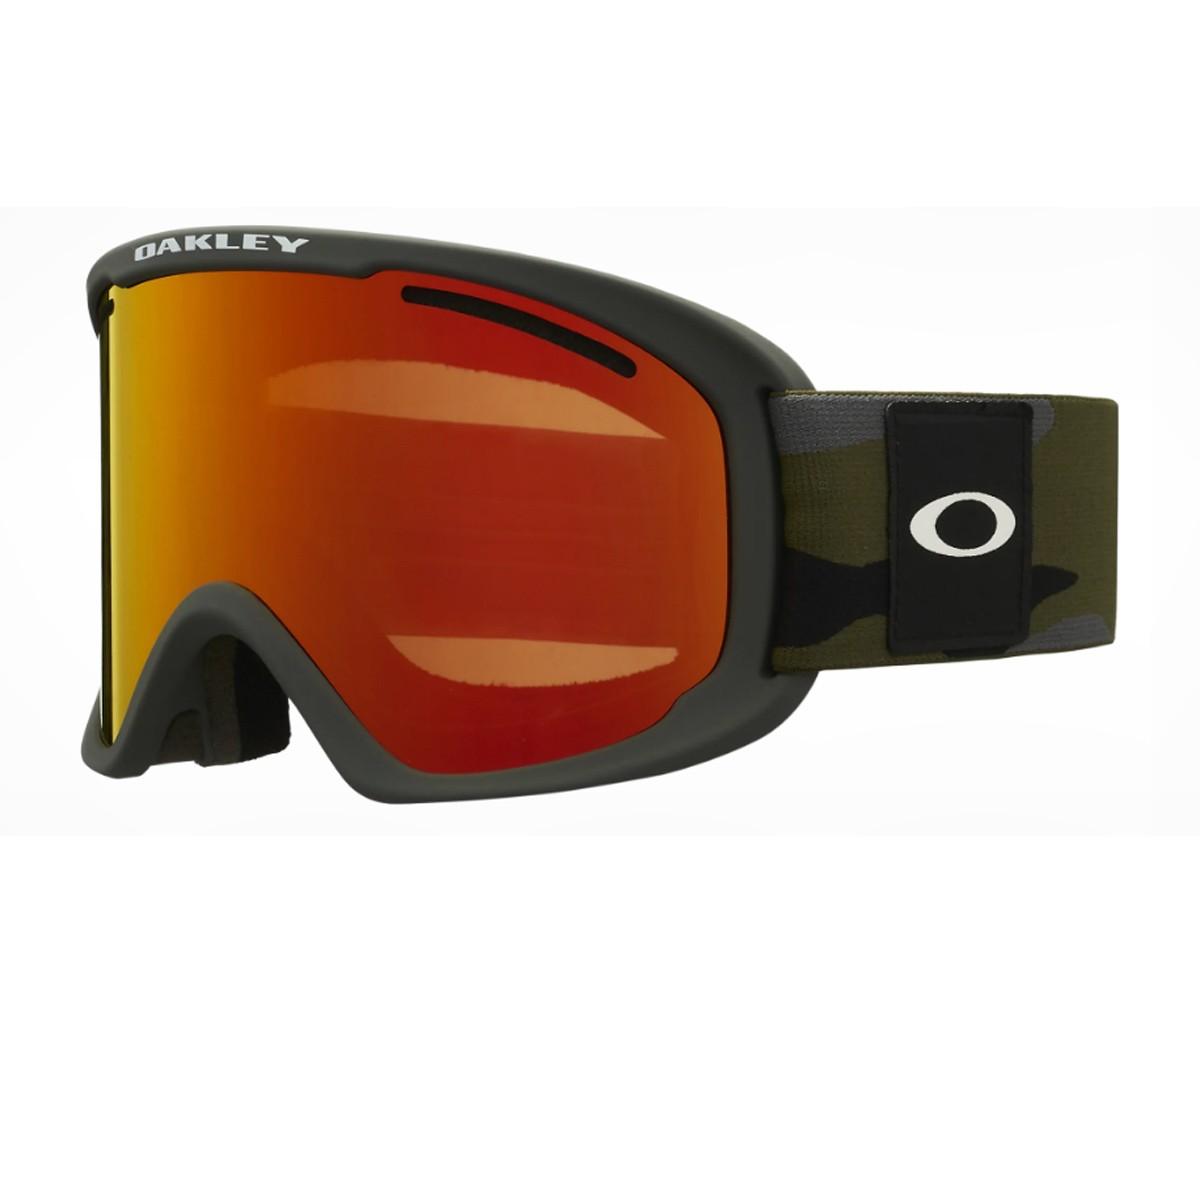 Oakley OO7112 O-Frame® 2.0 PRO XL Snow Goggles | Unisex sunglasses